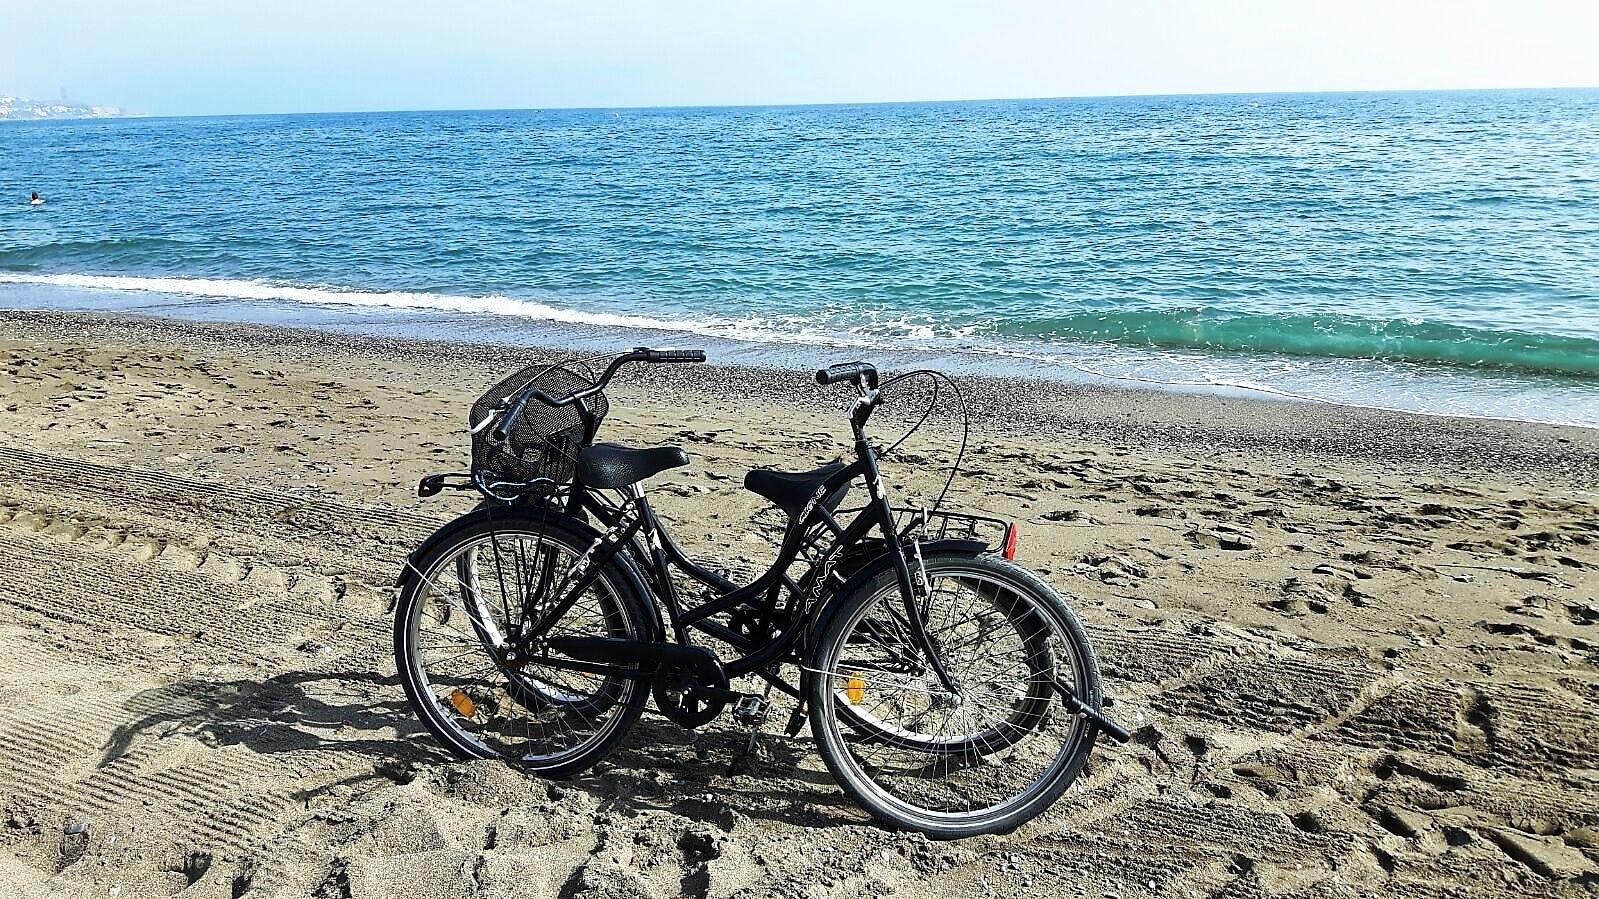 Alquilar una bicicleta Malaga - wwwebikemalaga.es.jpg